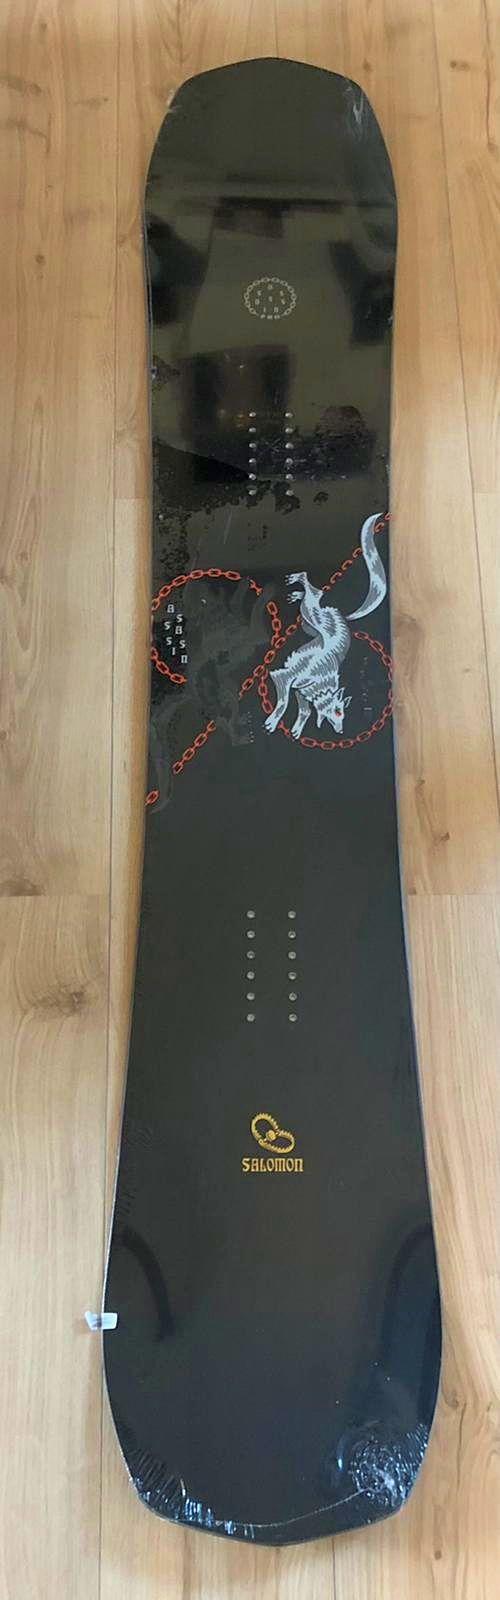 Snowboard Salomon assassin pro 159cm